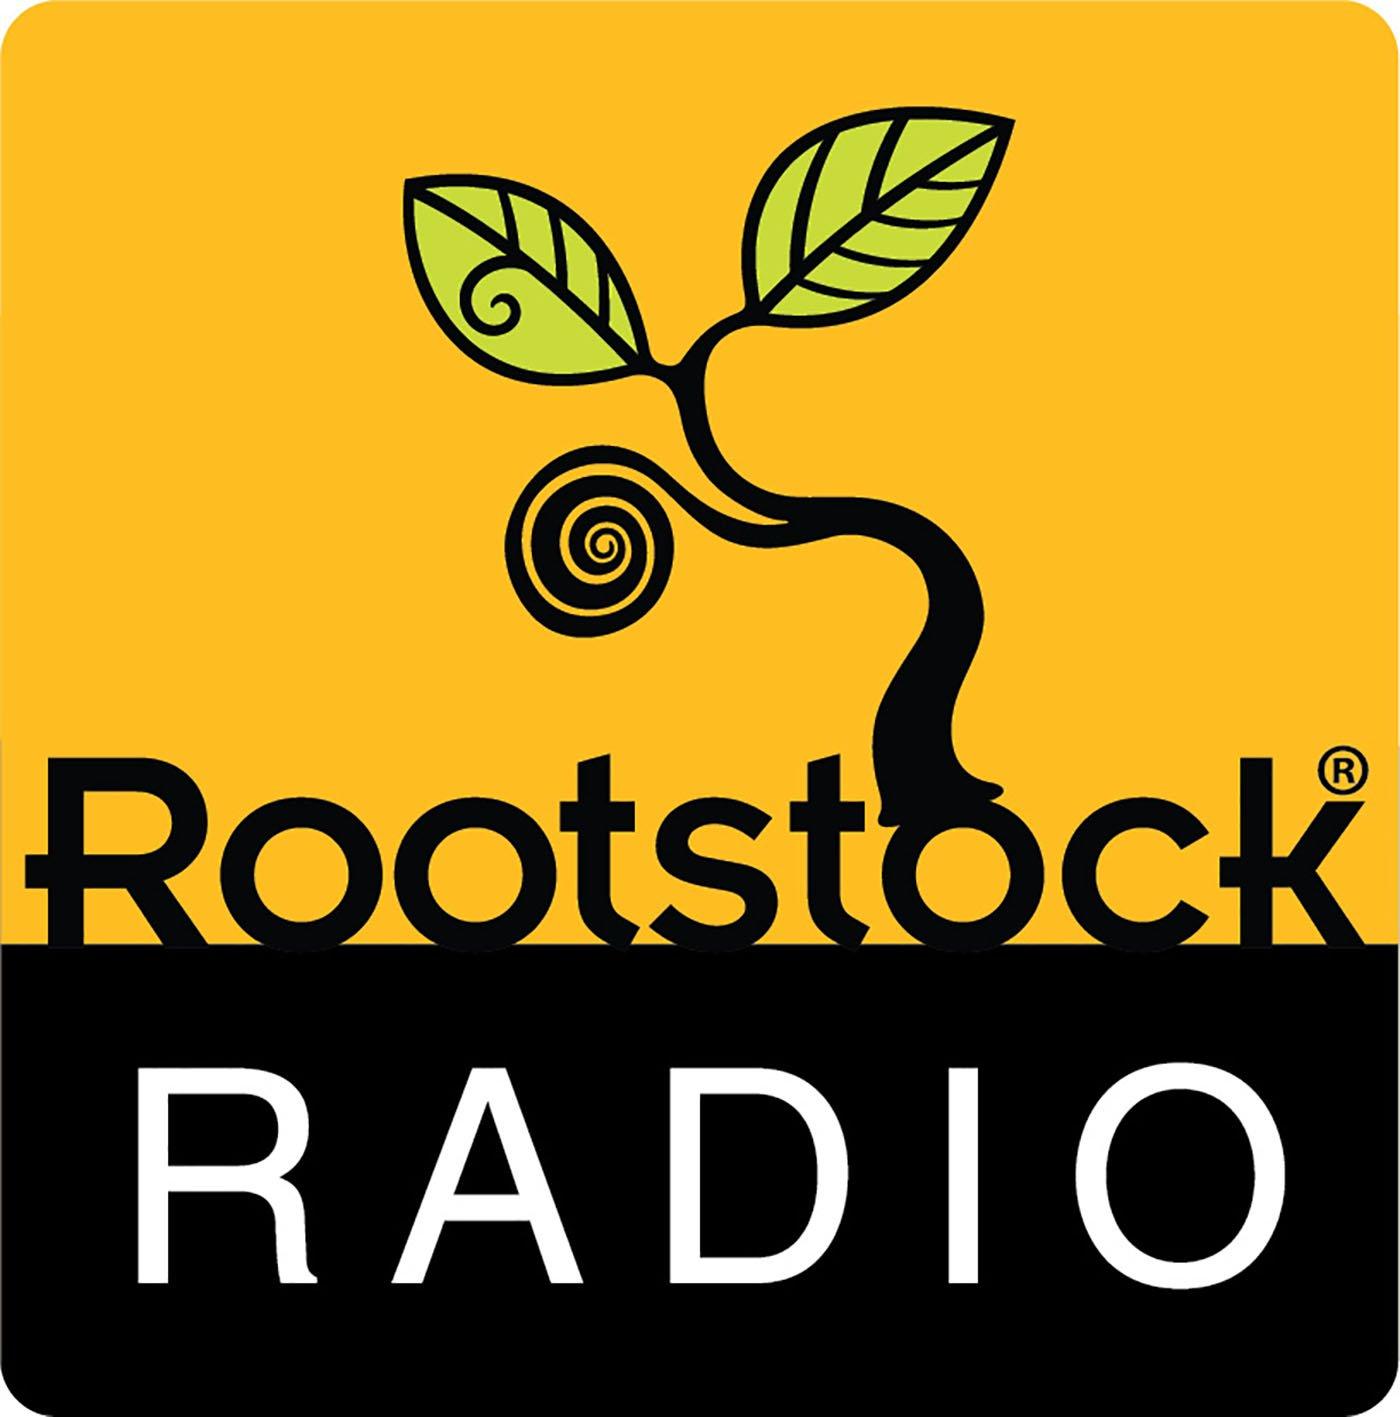 Rootstock Radio show art